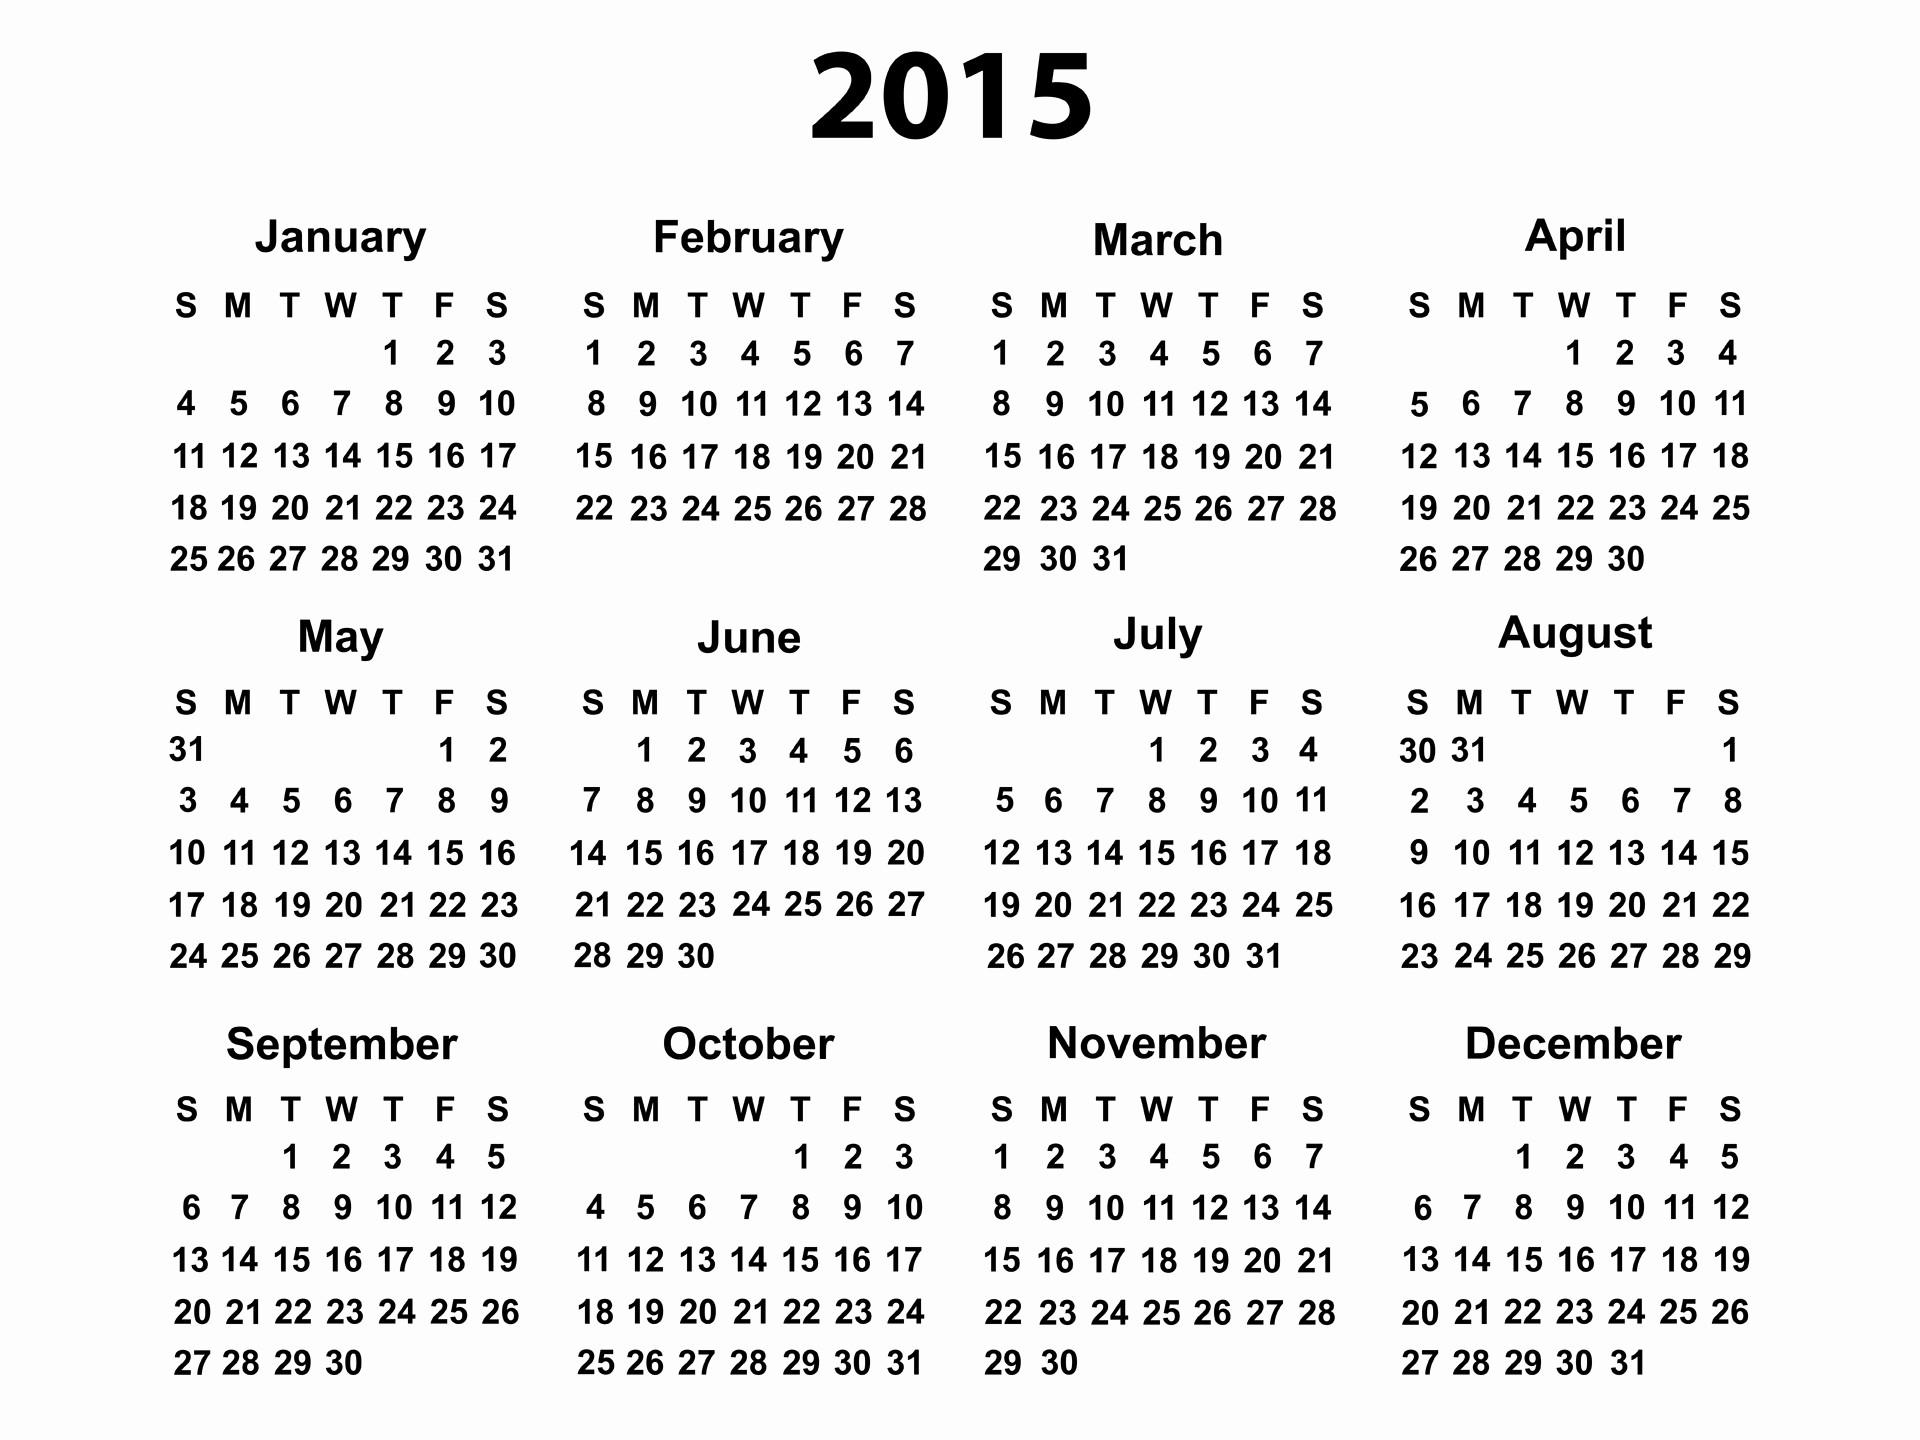 Monday Through Sunday Calendar Template Luxury Printable 2015 Calendar Monday Through Sunday